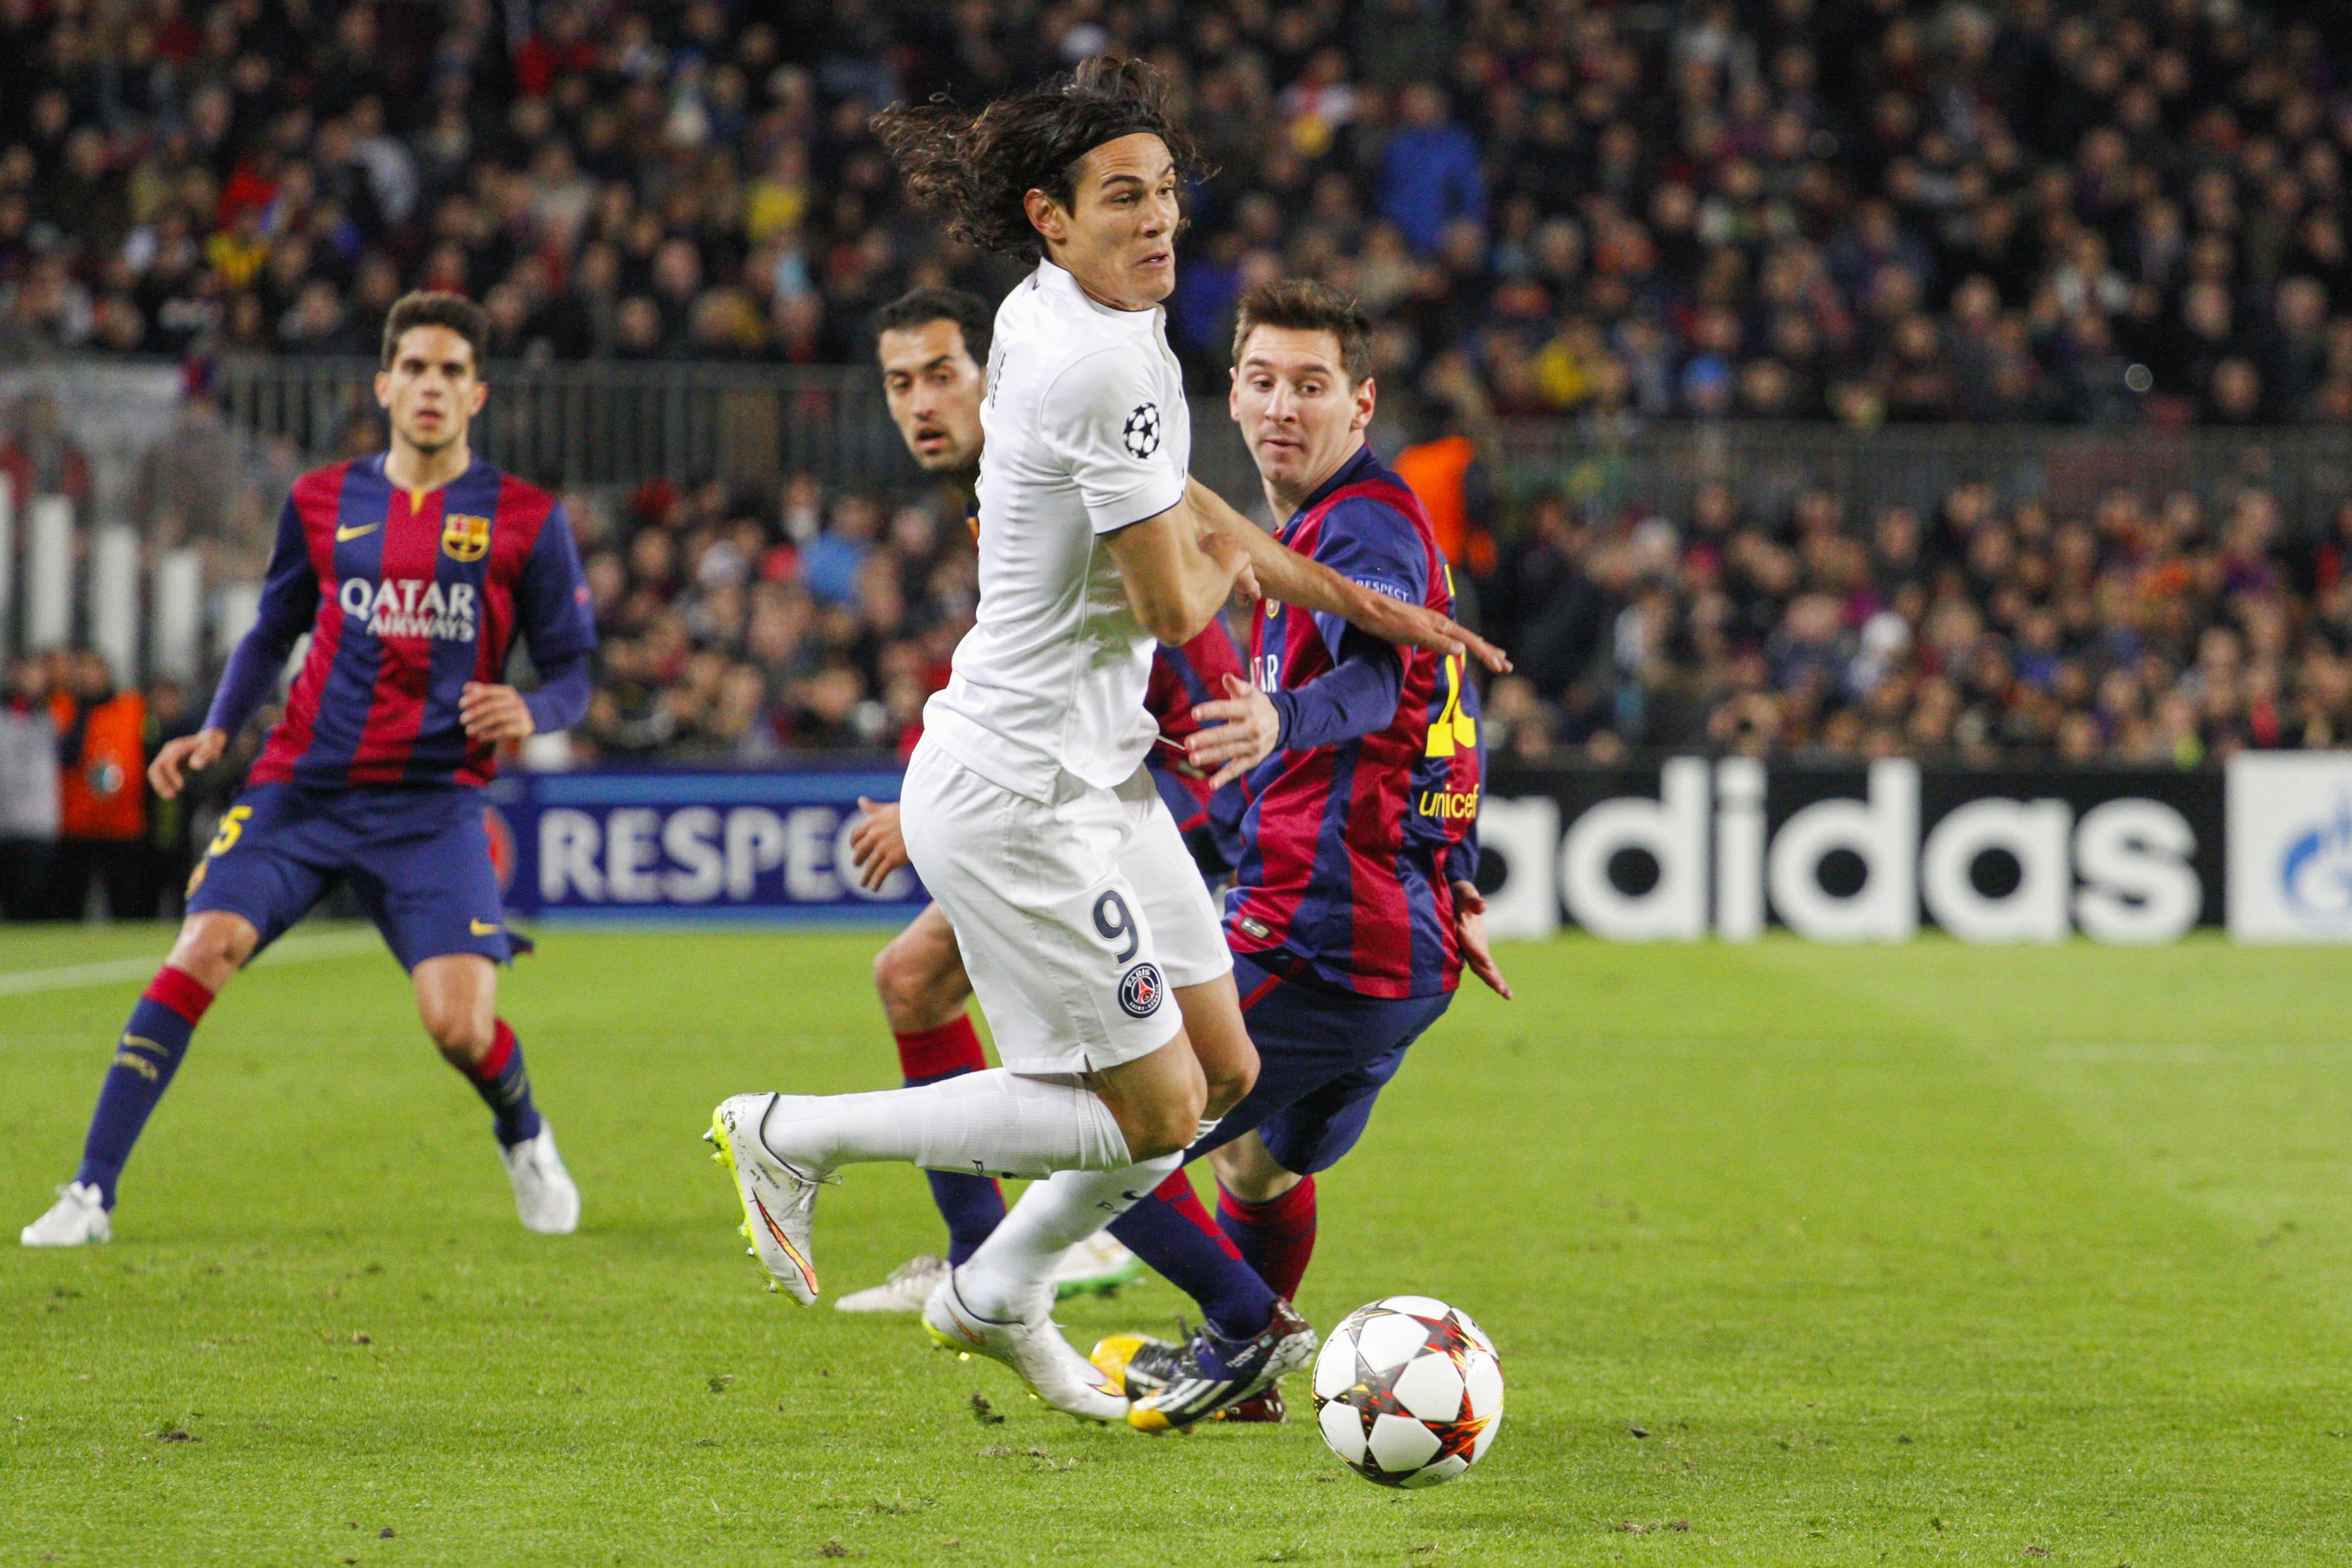 Lionel Messi involved in tunnel bust-up with Paris Saint-Germain's Edinson Cavani